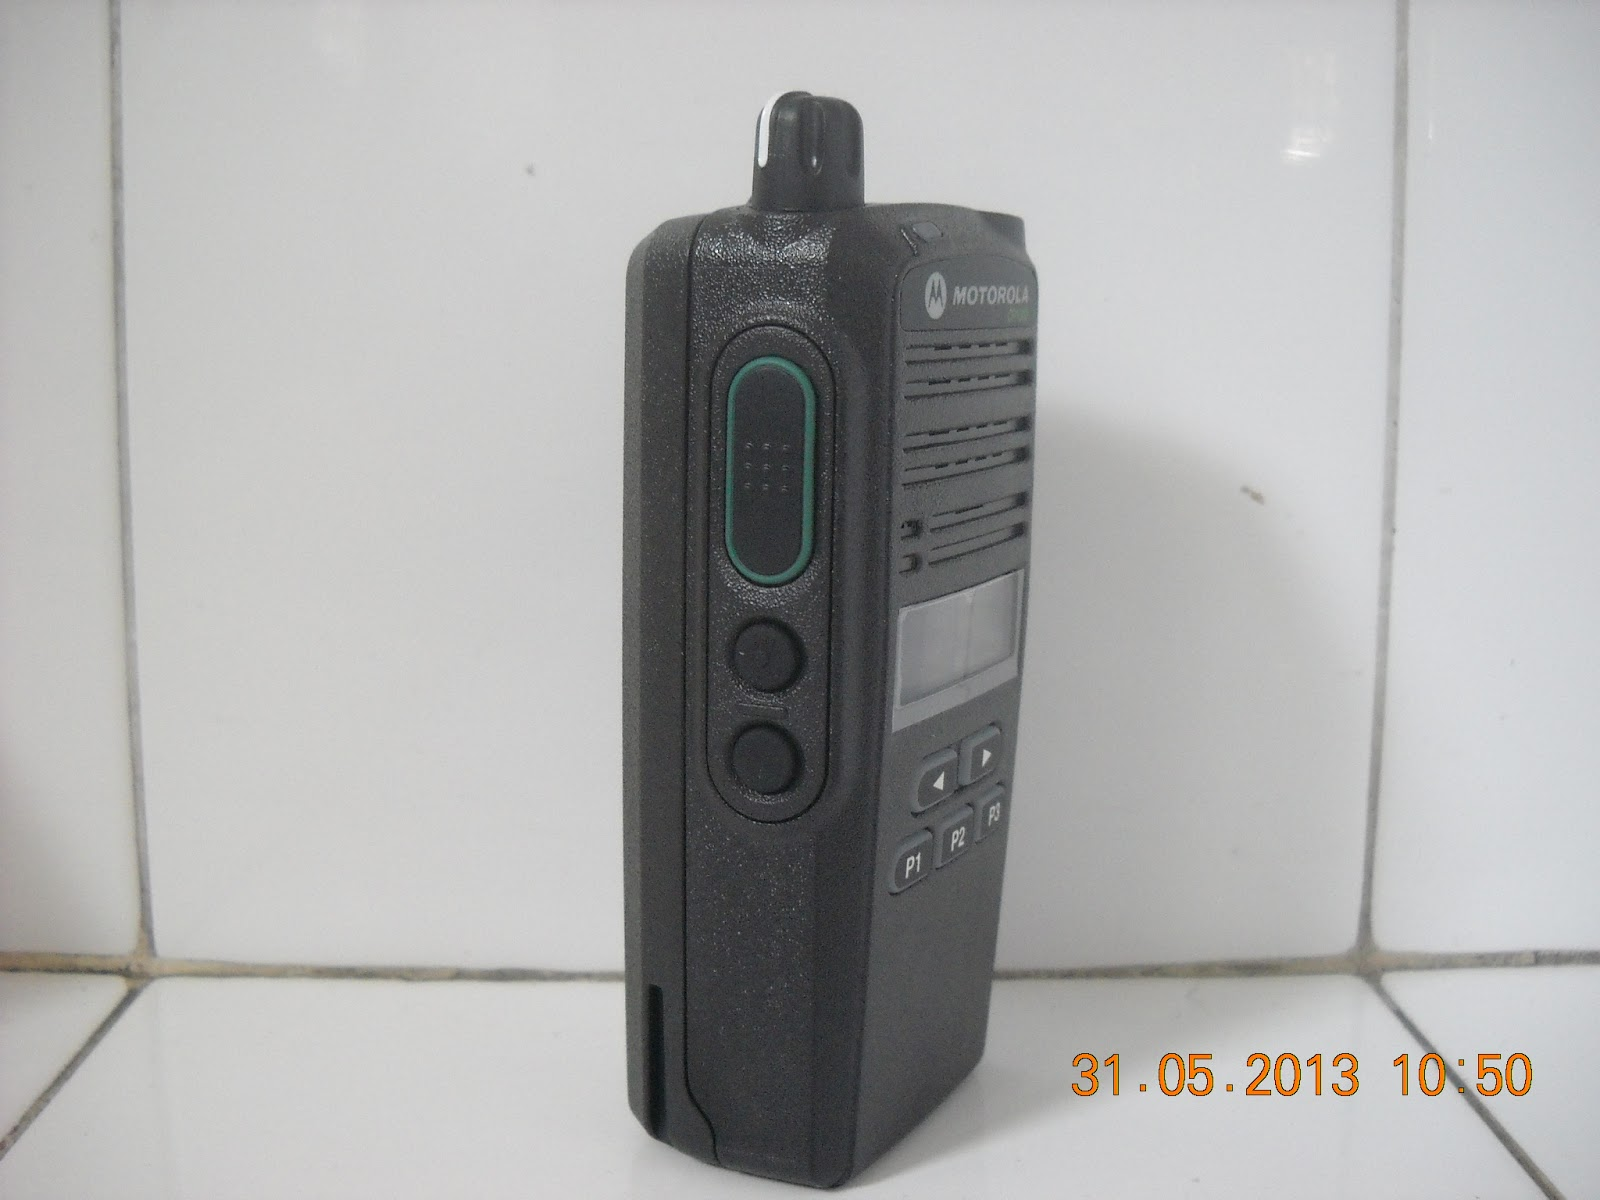 BARANG - HT MOTOROLA CP 1300 - KONDISI BARU - FREQ VHF - BATT LITIUM ...